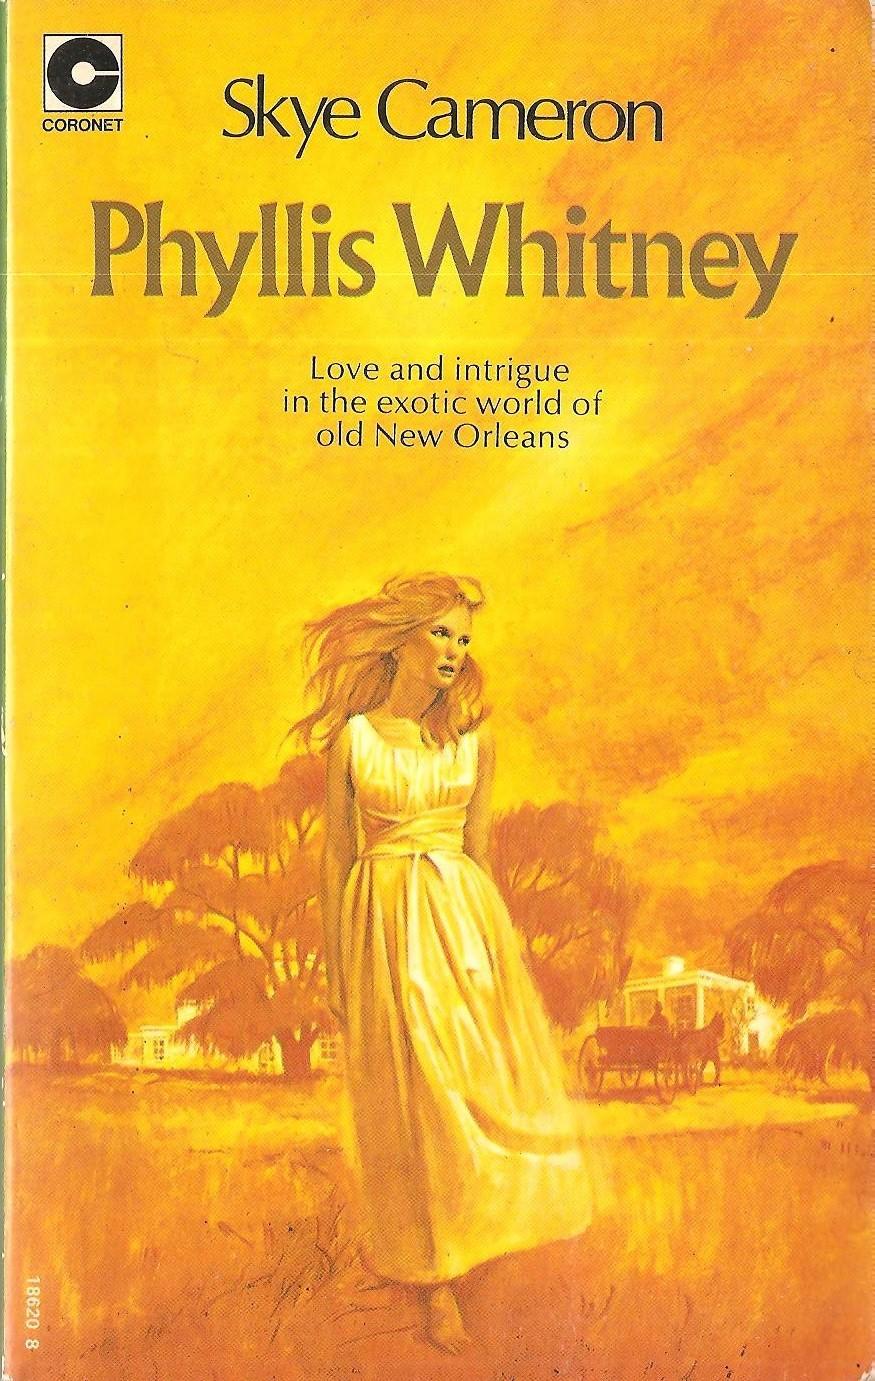 Skye Cameron (livre en anglais - english book) - Phyllis A. Whitney